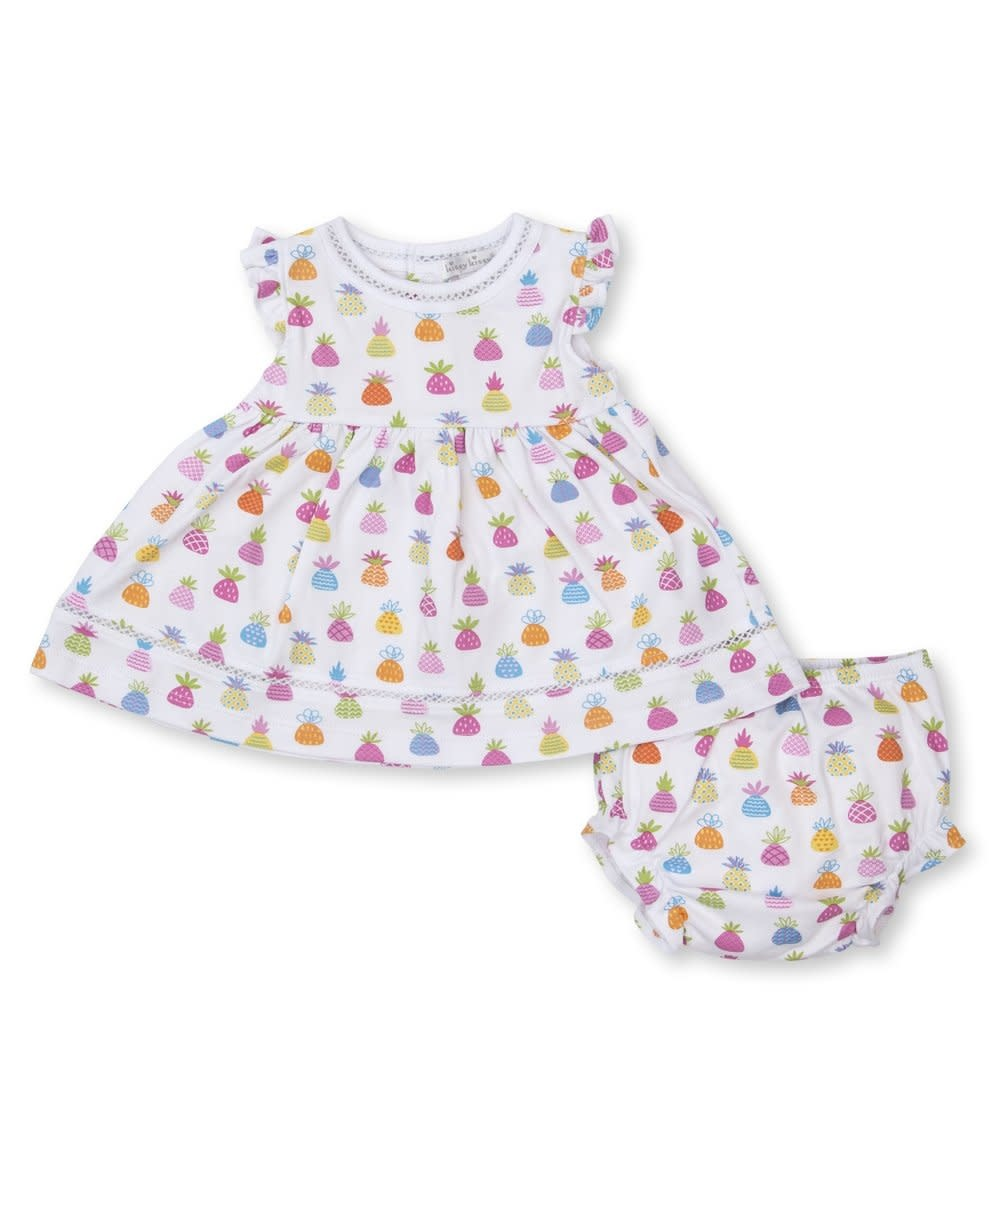 Kissy Kissy Pineapple Island Dress Set